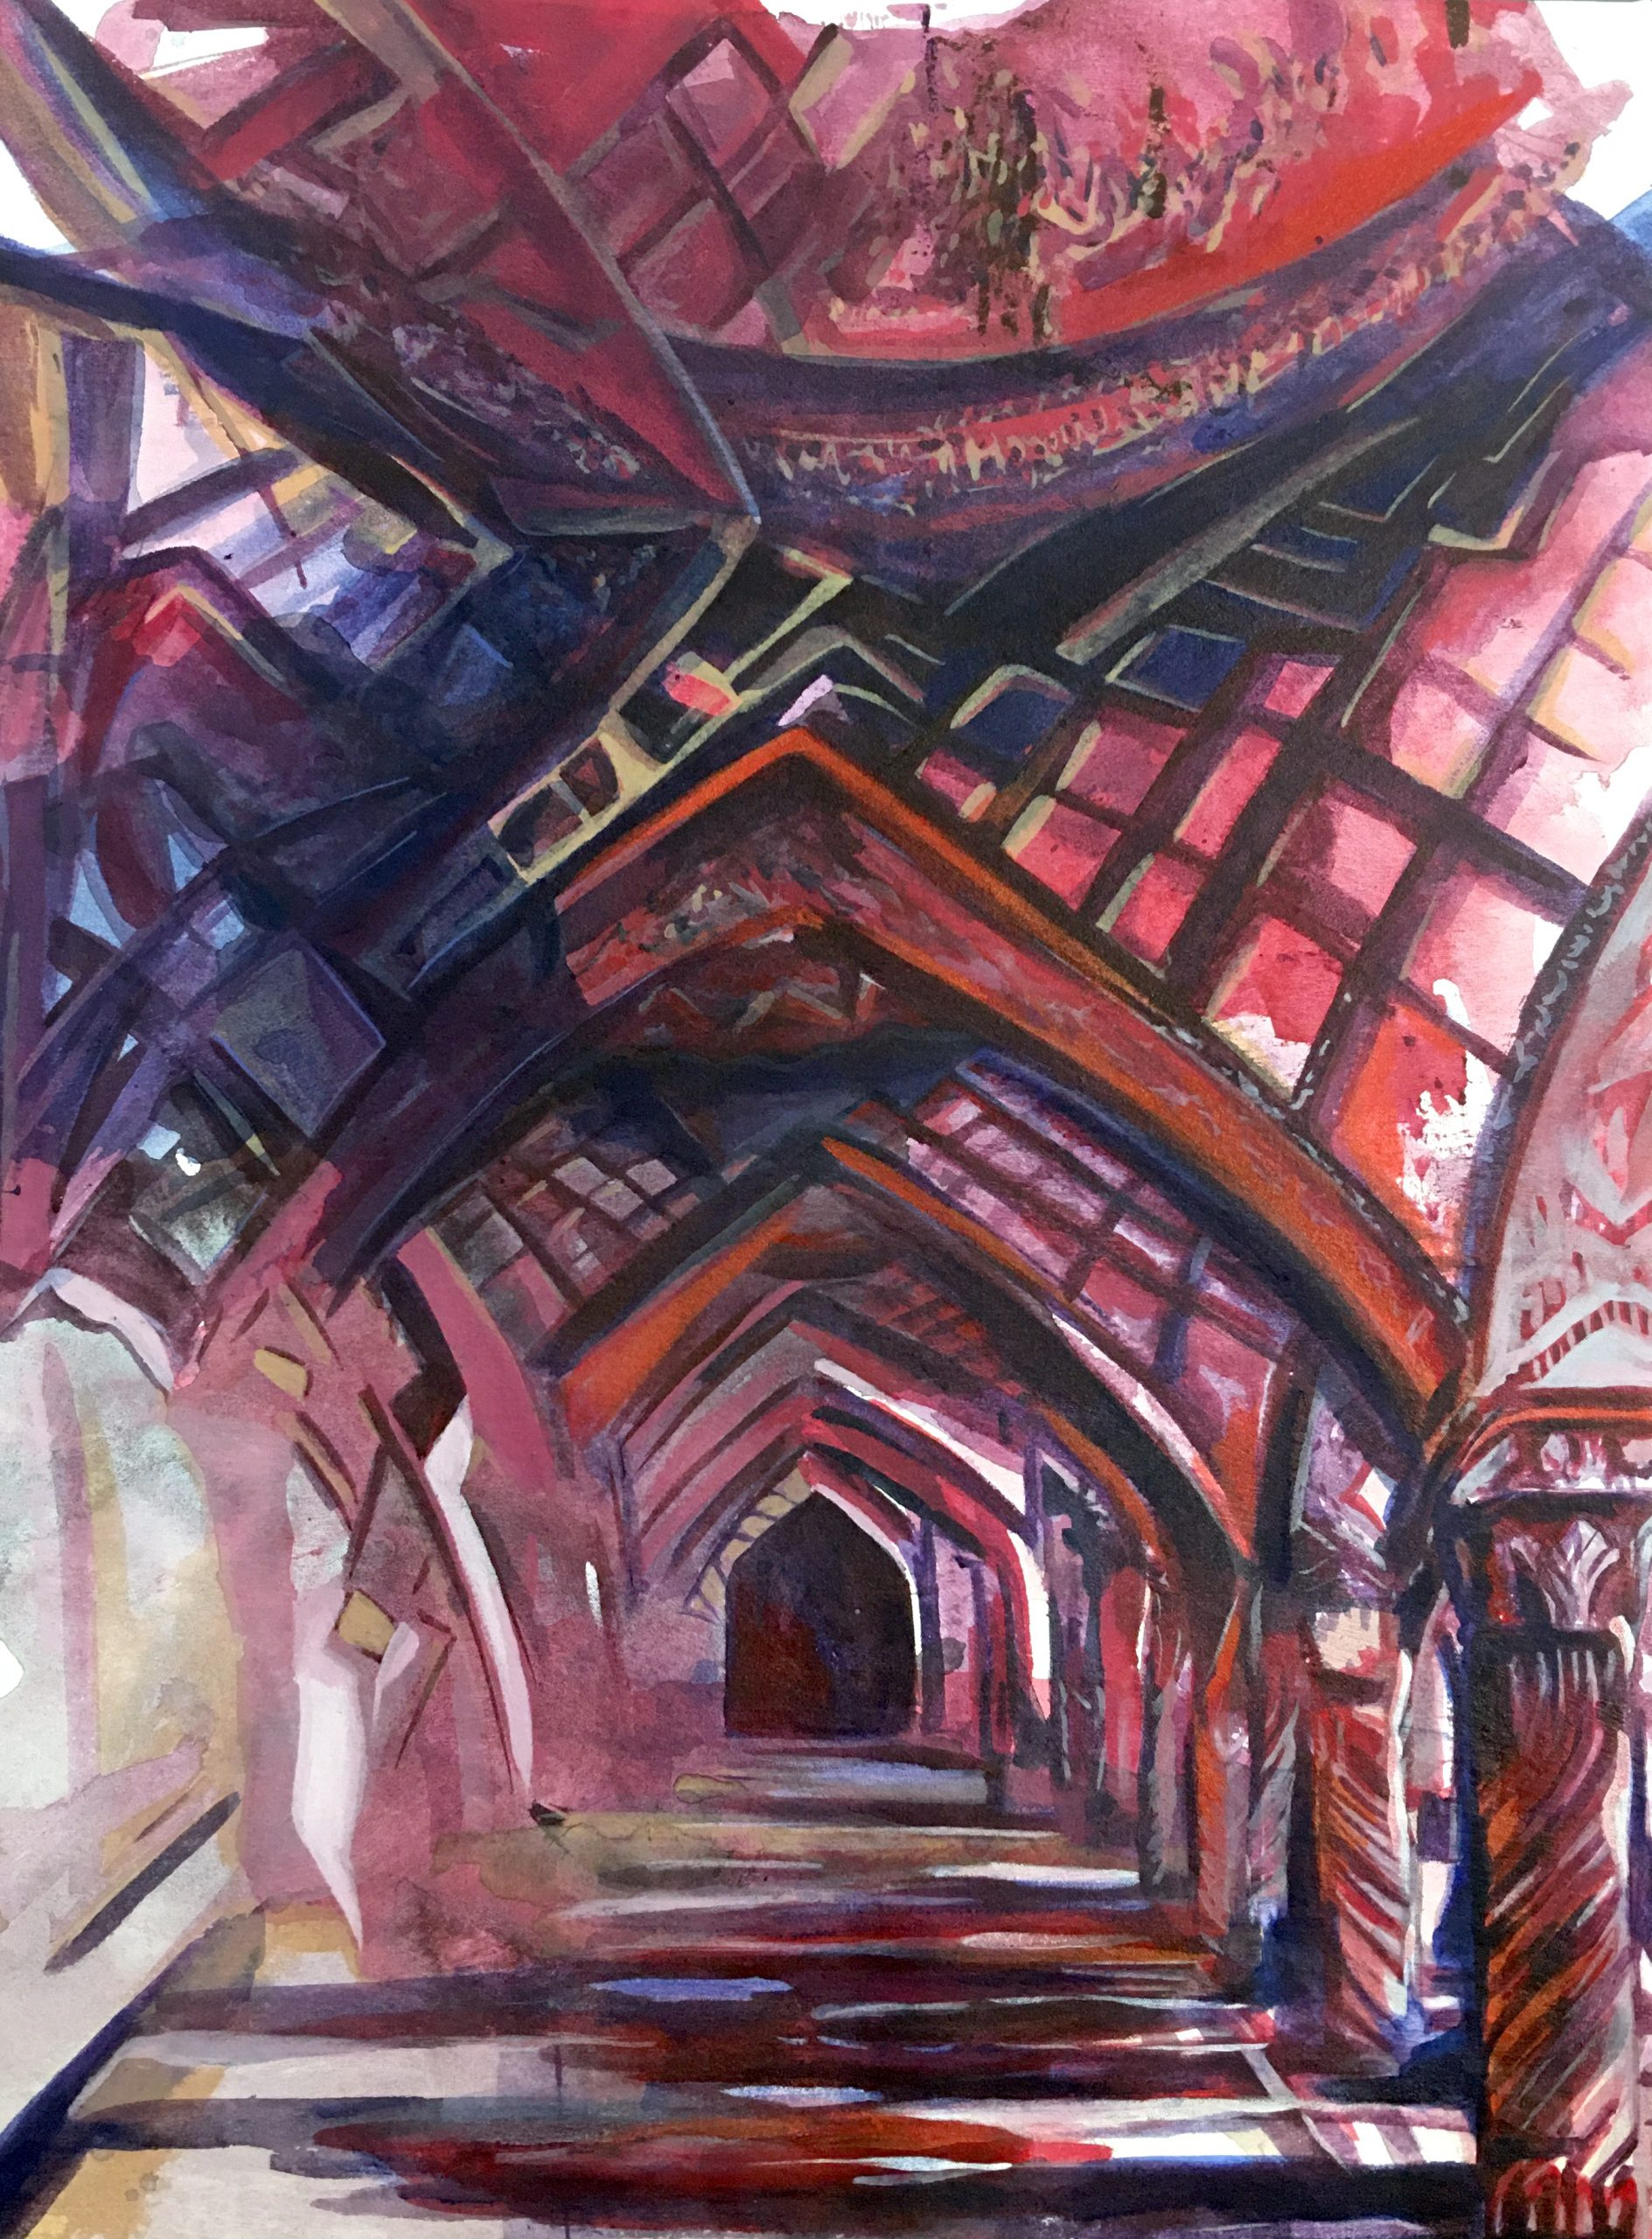 Nasir al-Mulk Mosque, acrylic on canvas, 40x30 inches, 2020